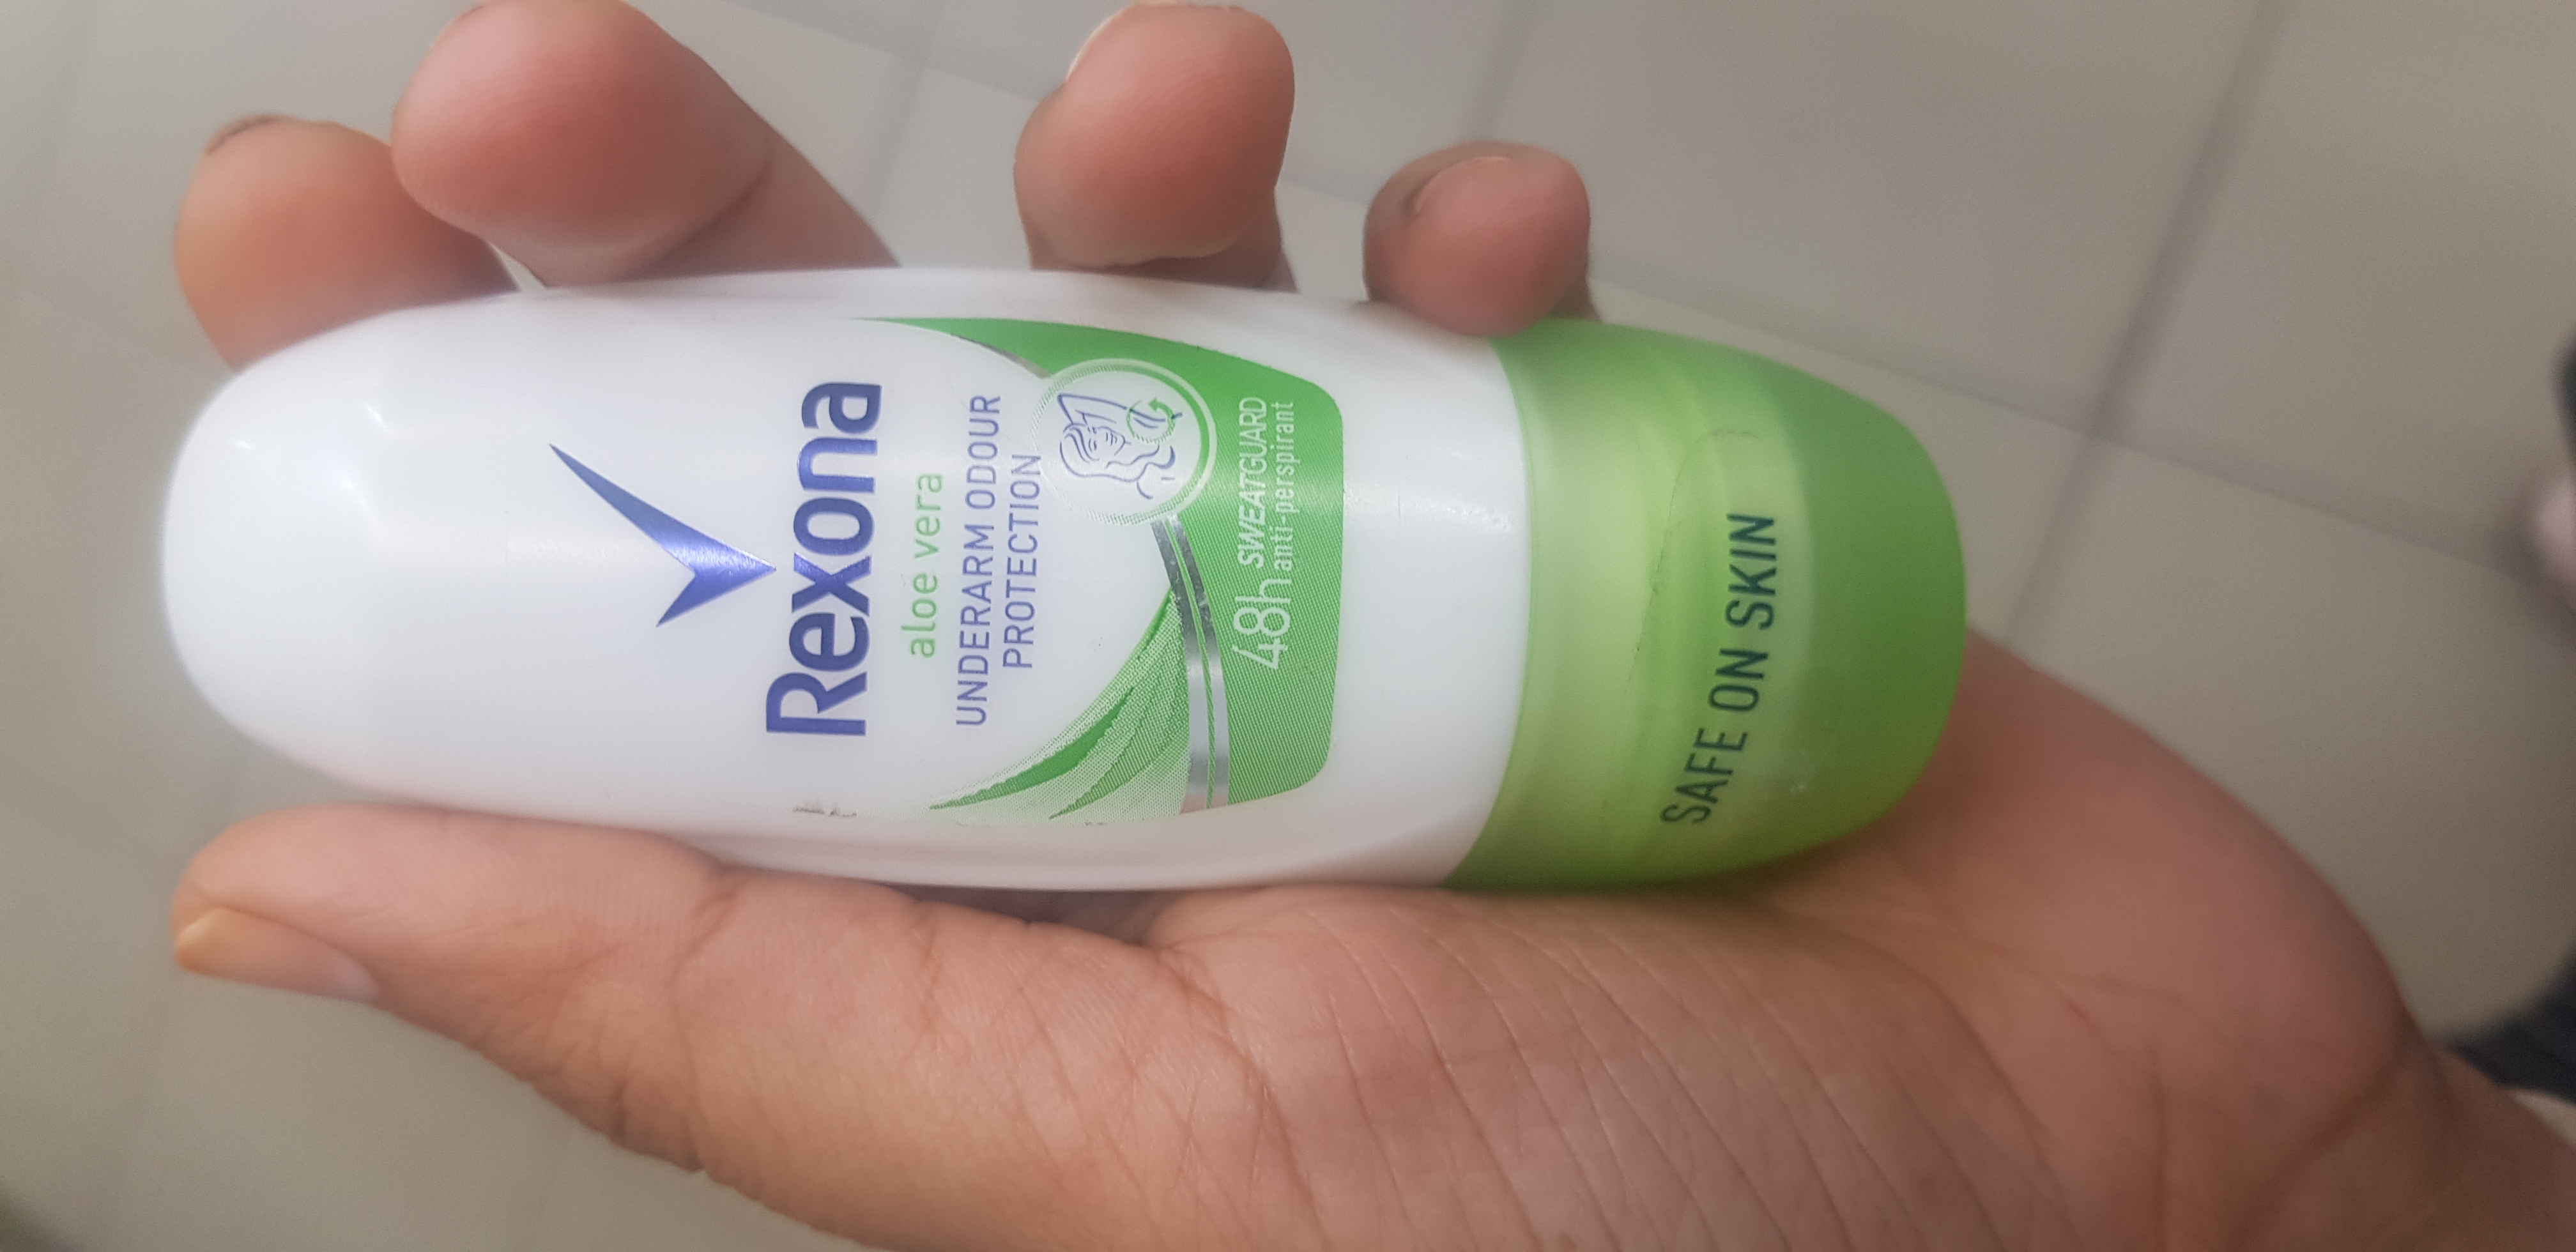 Rexona Aloe Vera Underarm Odour Protection Roll On-Good-By avyuktha